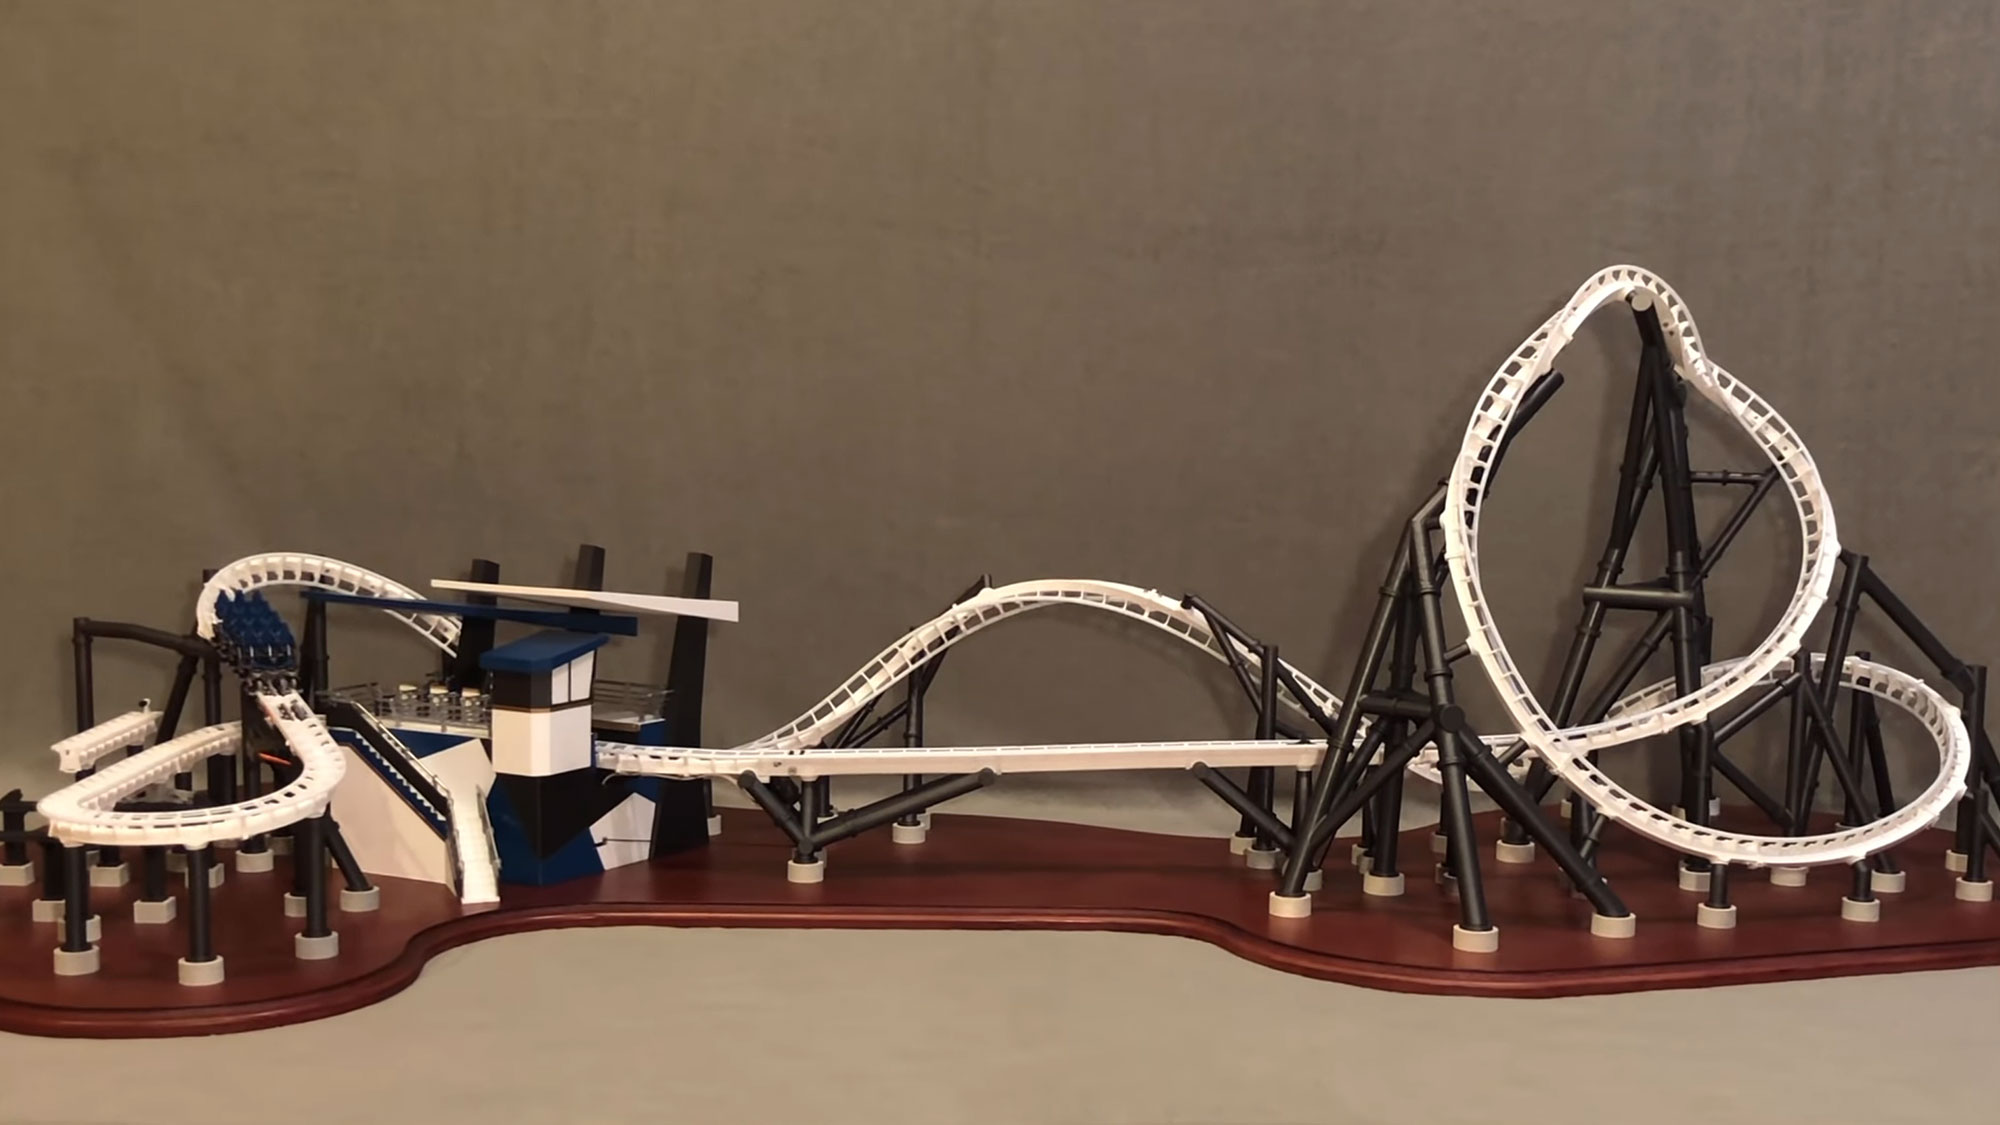 3D Printed Functional Model Roller Coaster